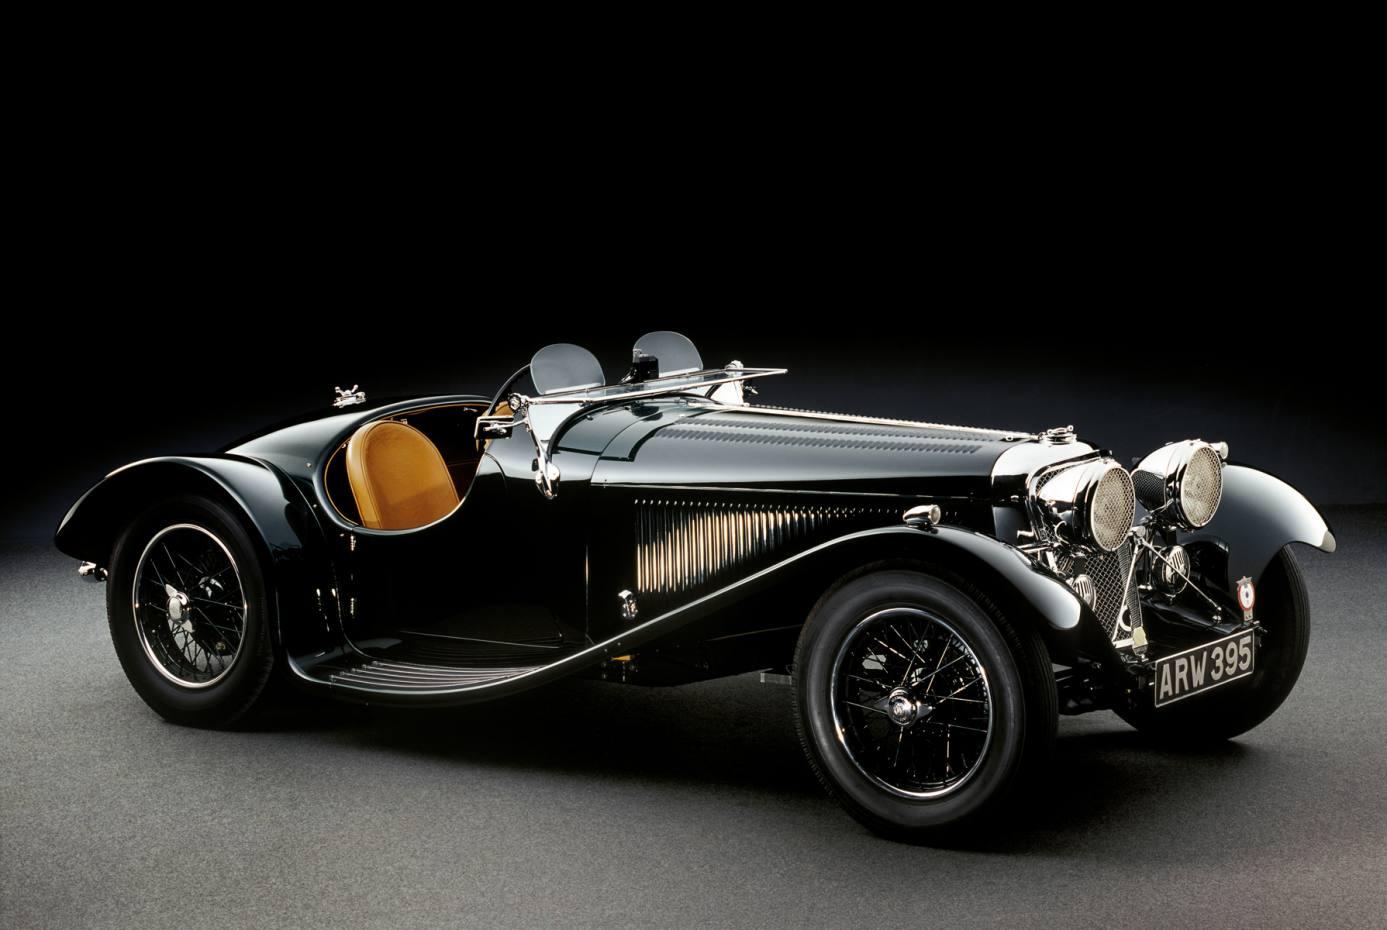 A 1935 Jaguar SS 90 Prototype